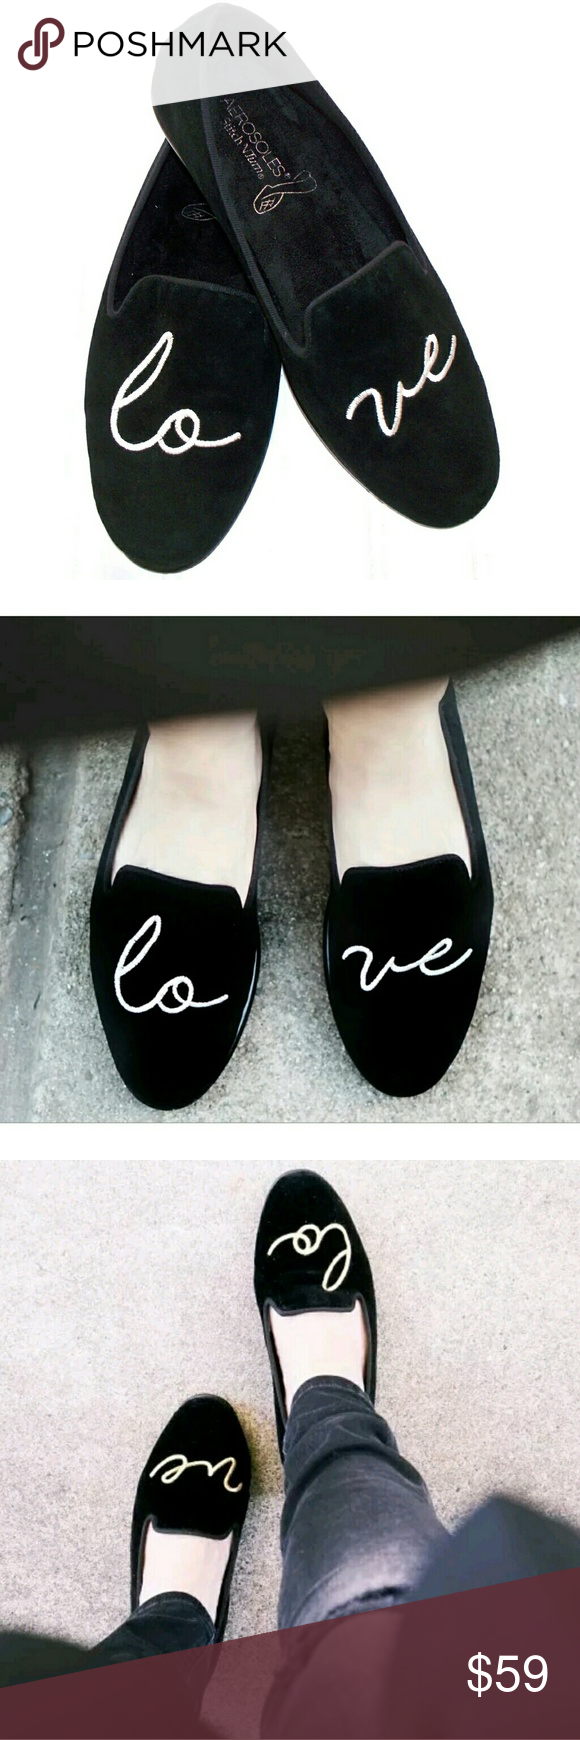 a04409e17bb AEROSOLES Betunia Love smoking slippers loafers Aerosoles Betunia Smoking  Slippers are wonderfully charming thanks to its